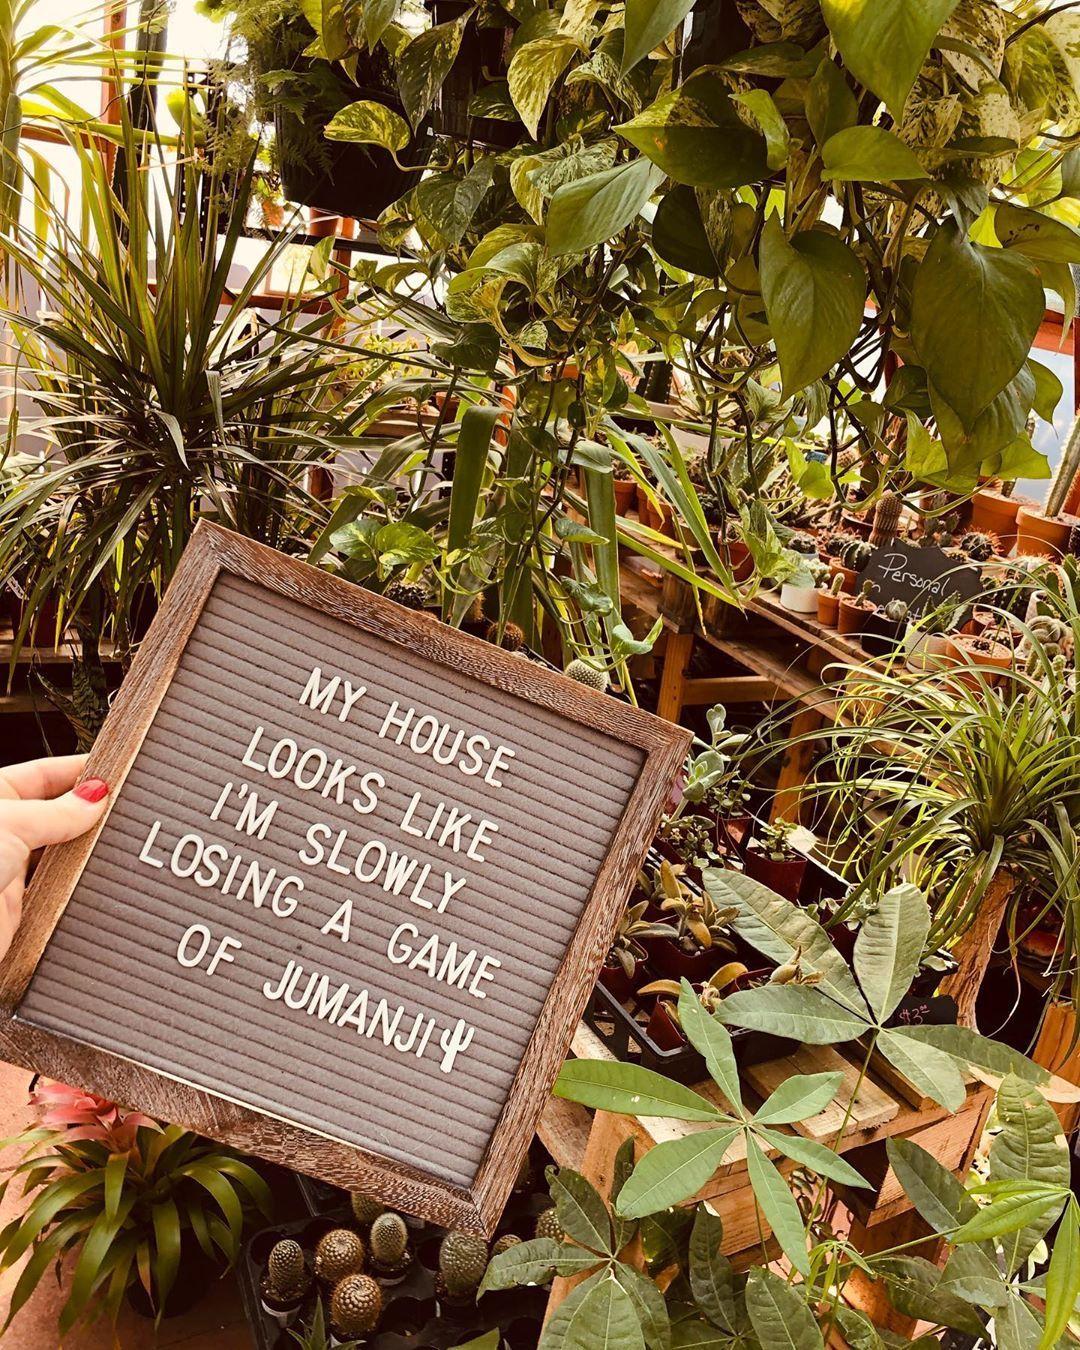 SucculentCity.com   Community of Succulent, Cacti & Plant Lovers